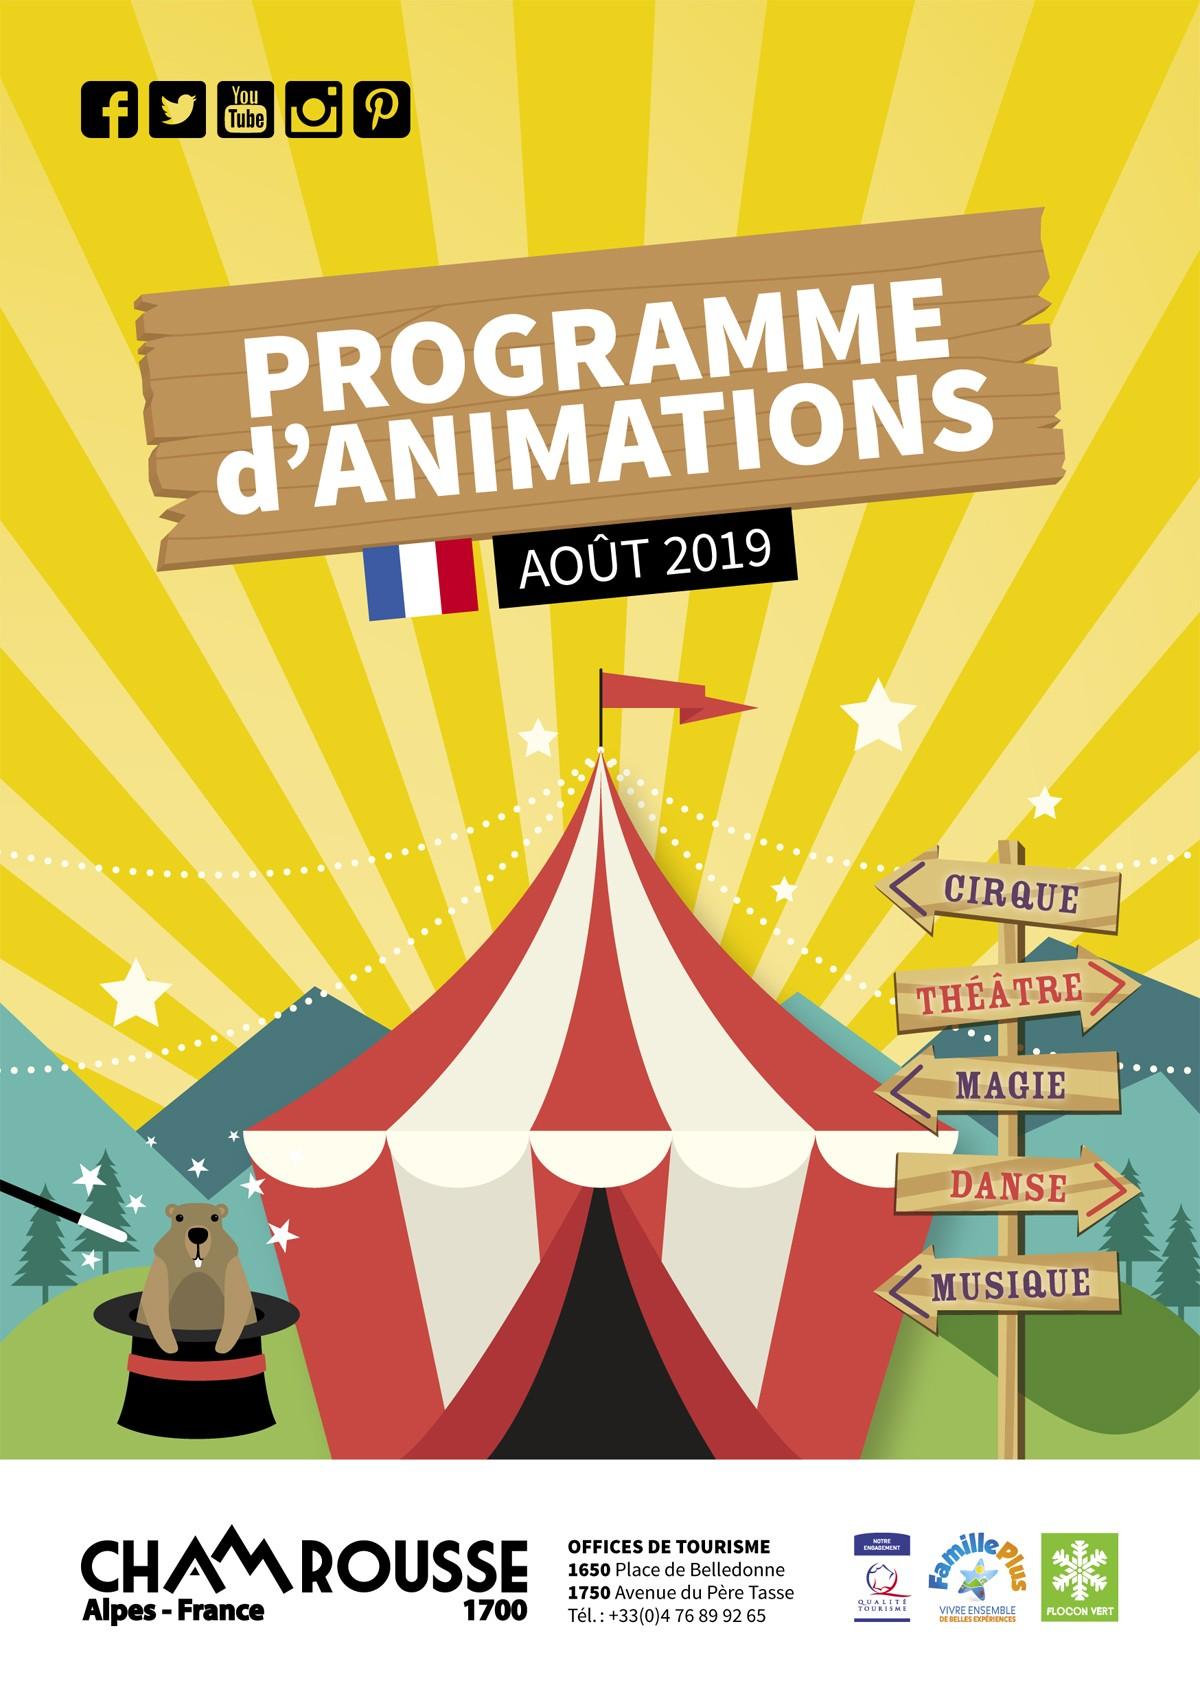 Programme animations août 2019 Chamrousse